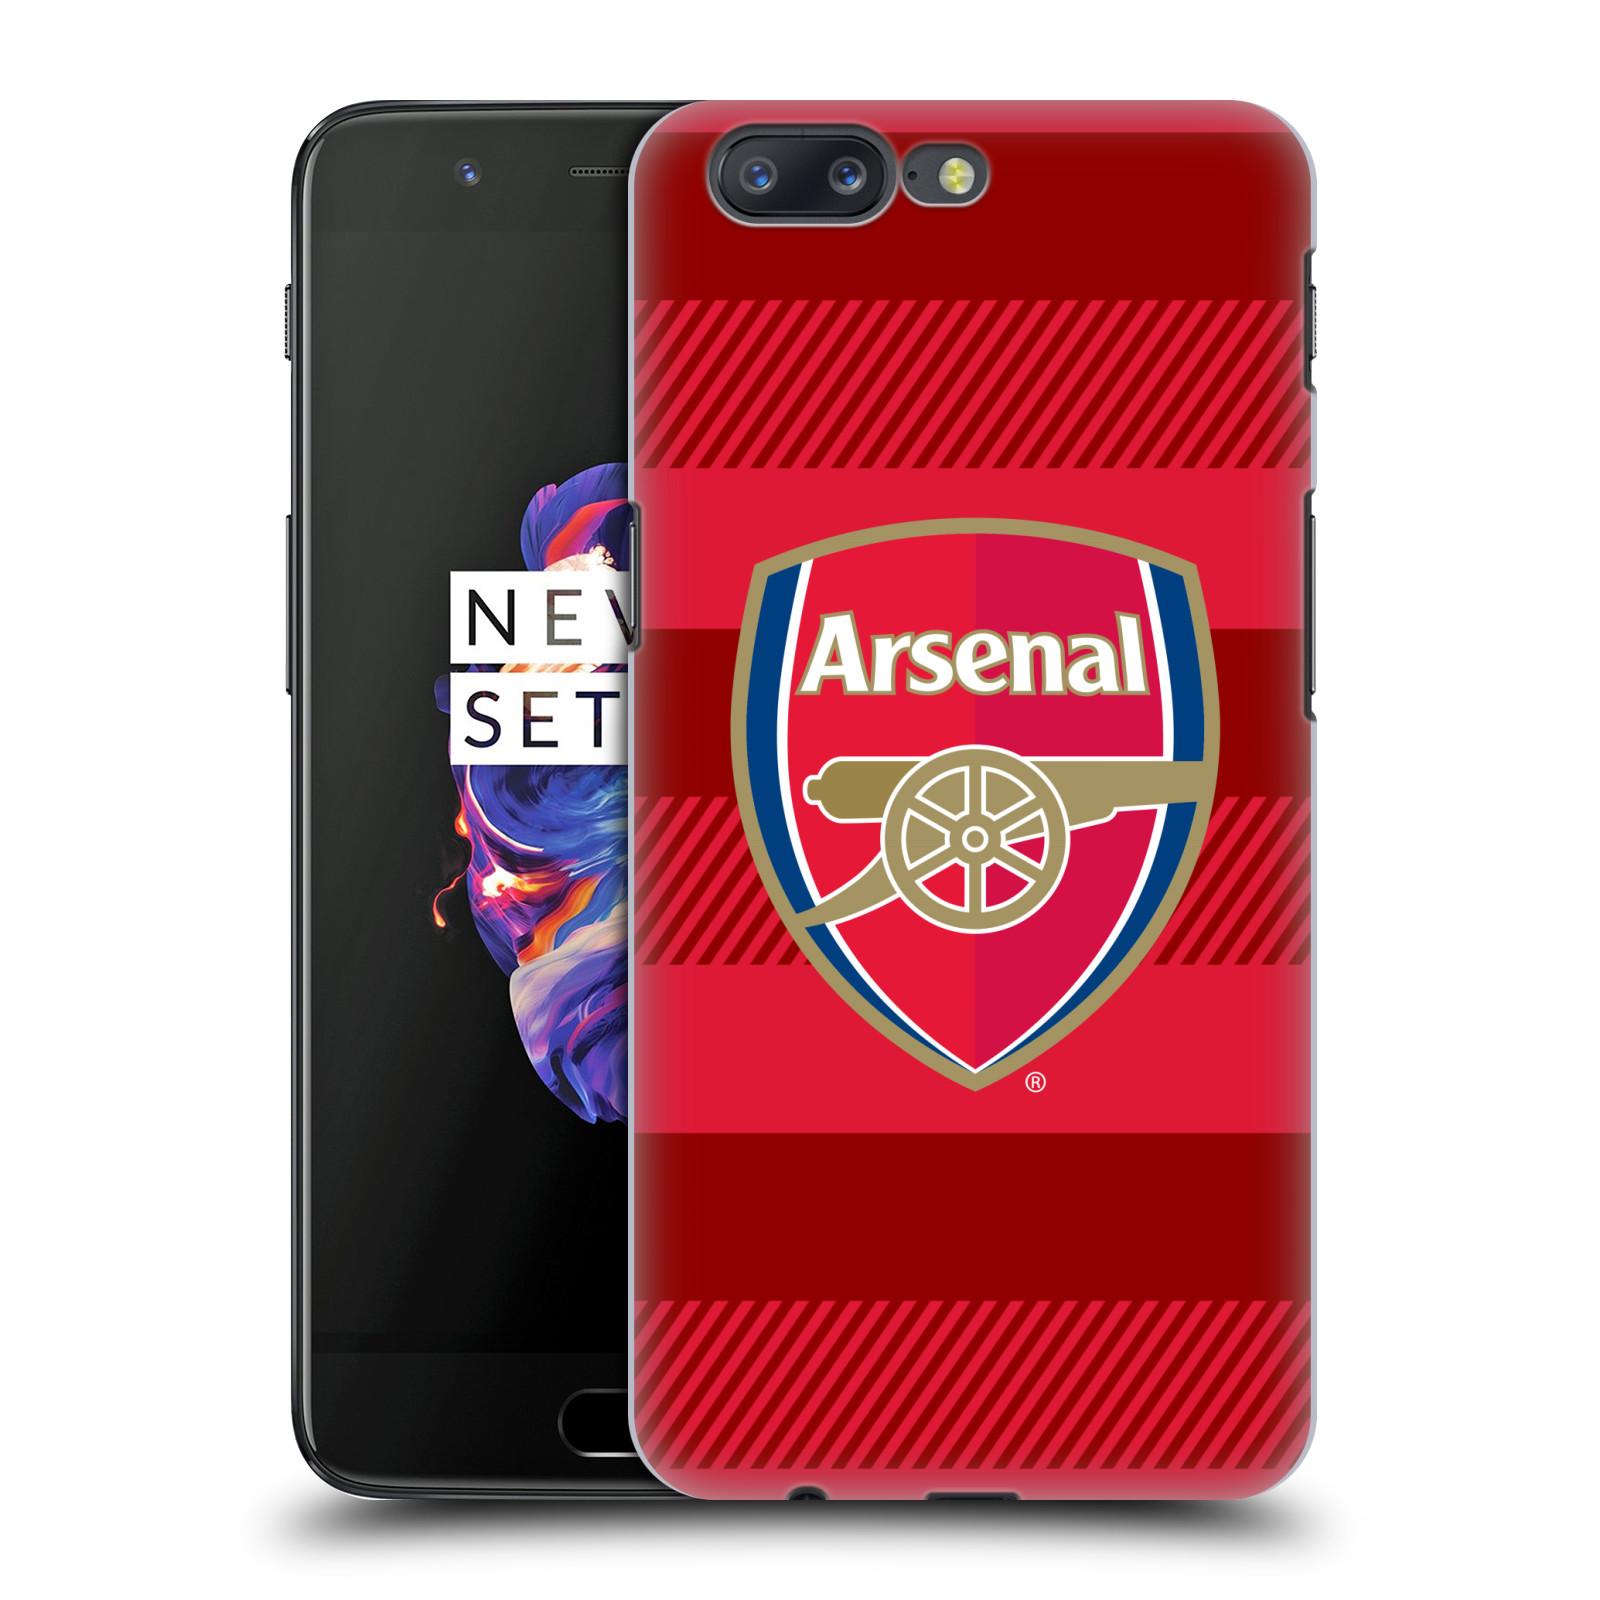 Plastové pouzdro na mobil OnePlus 5 - Head Case - Arsenal FC - Logo s pruhy